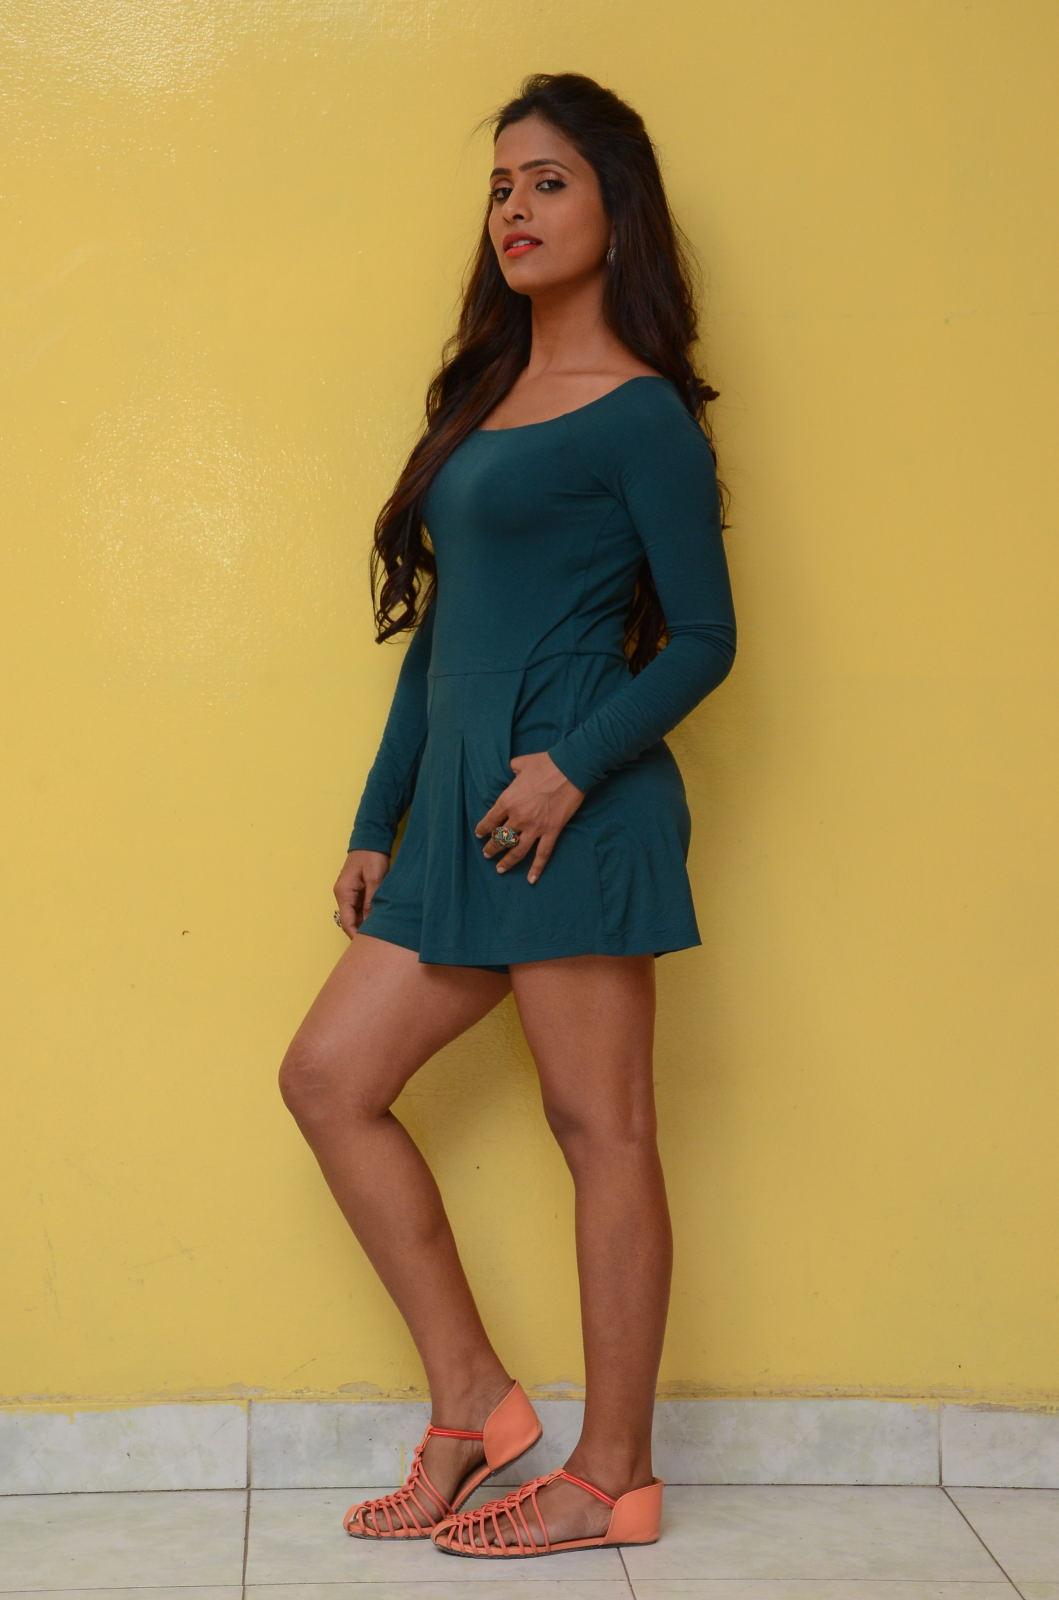 Super Hot Prashanthi In Sexy Outfit  Indian Cinema  Models  Actress-2053